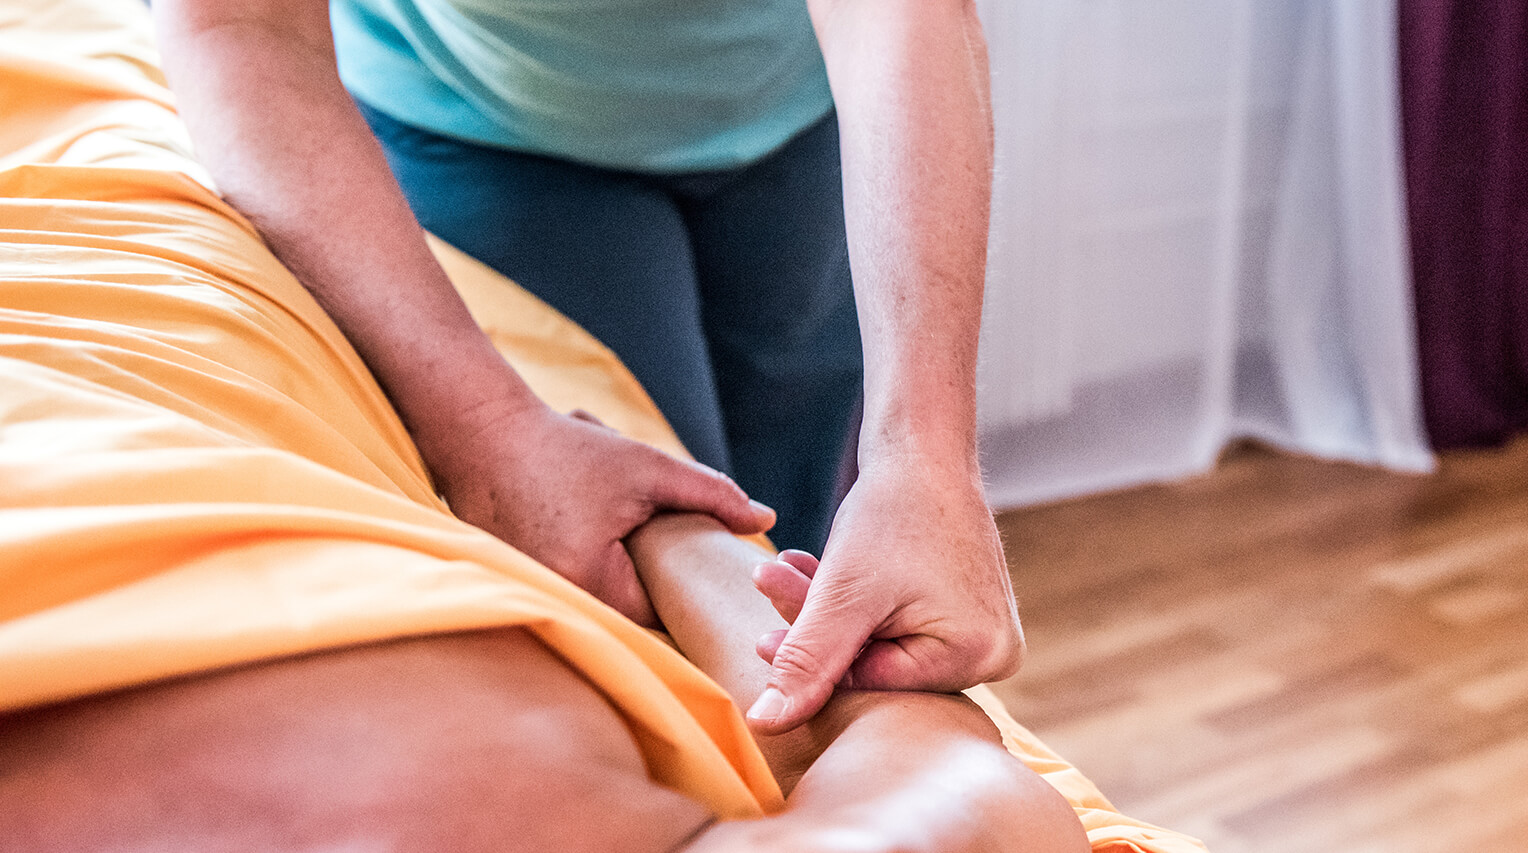 Somatic Healing Arts Massagen in Zürich